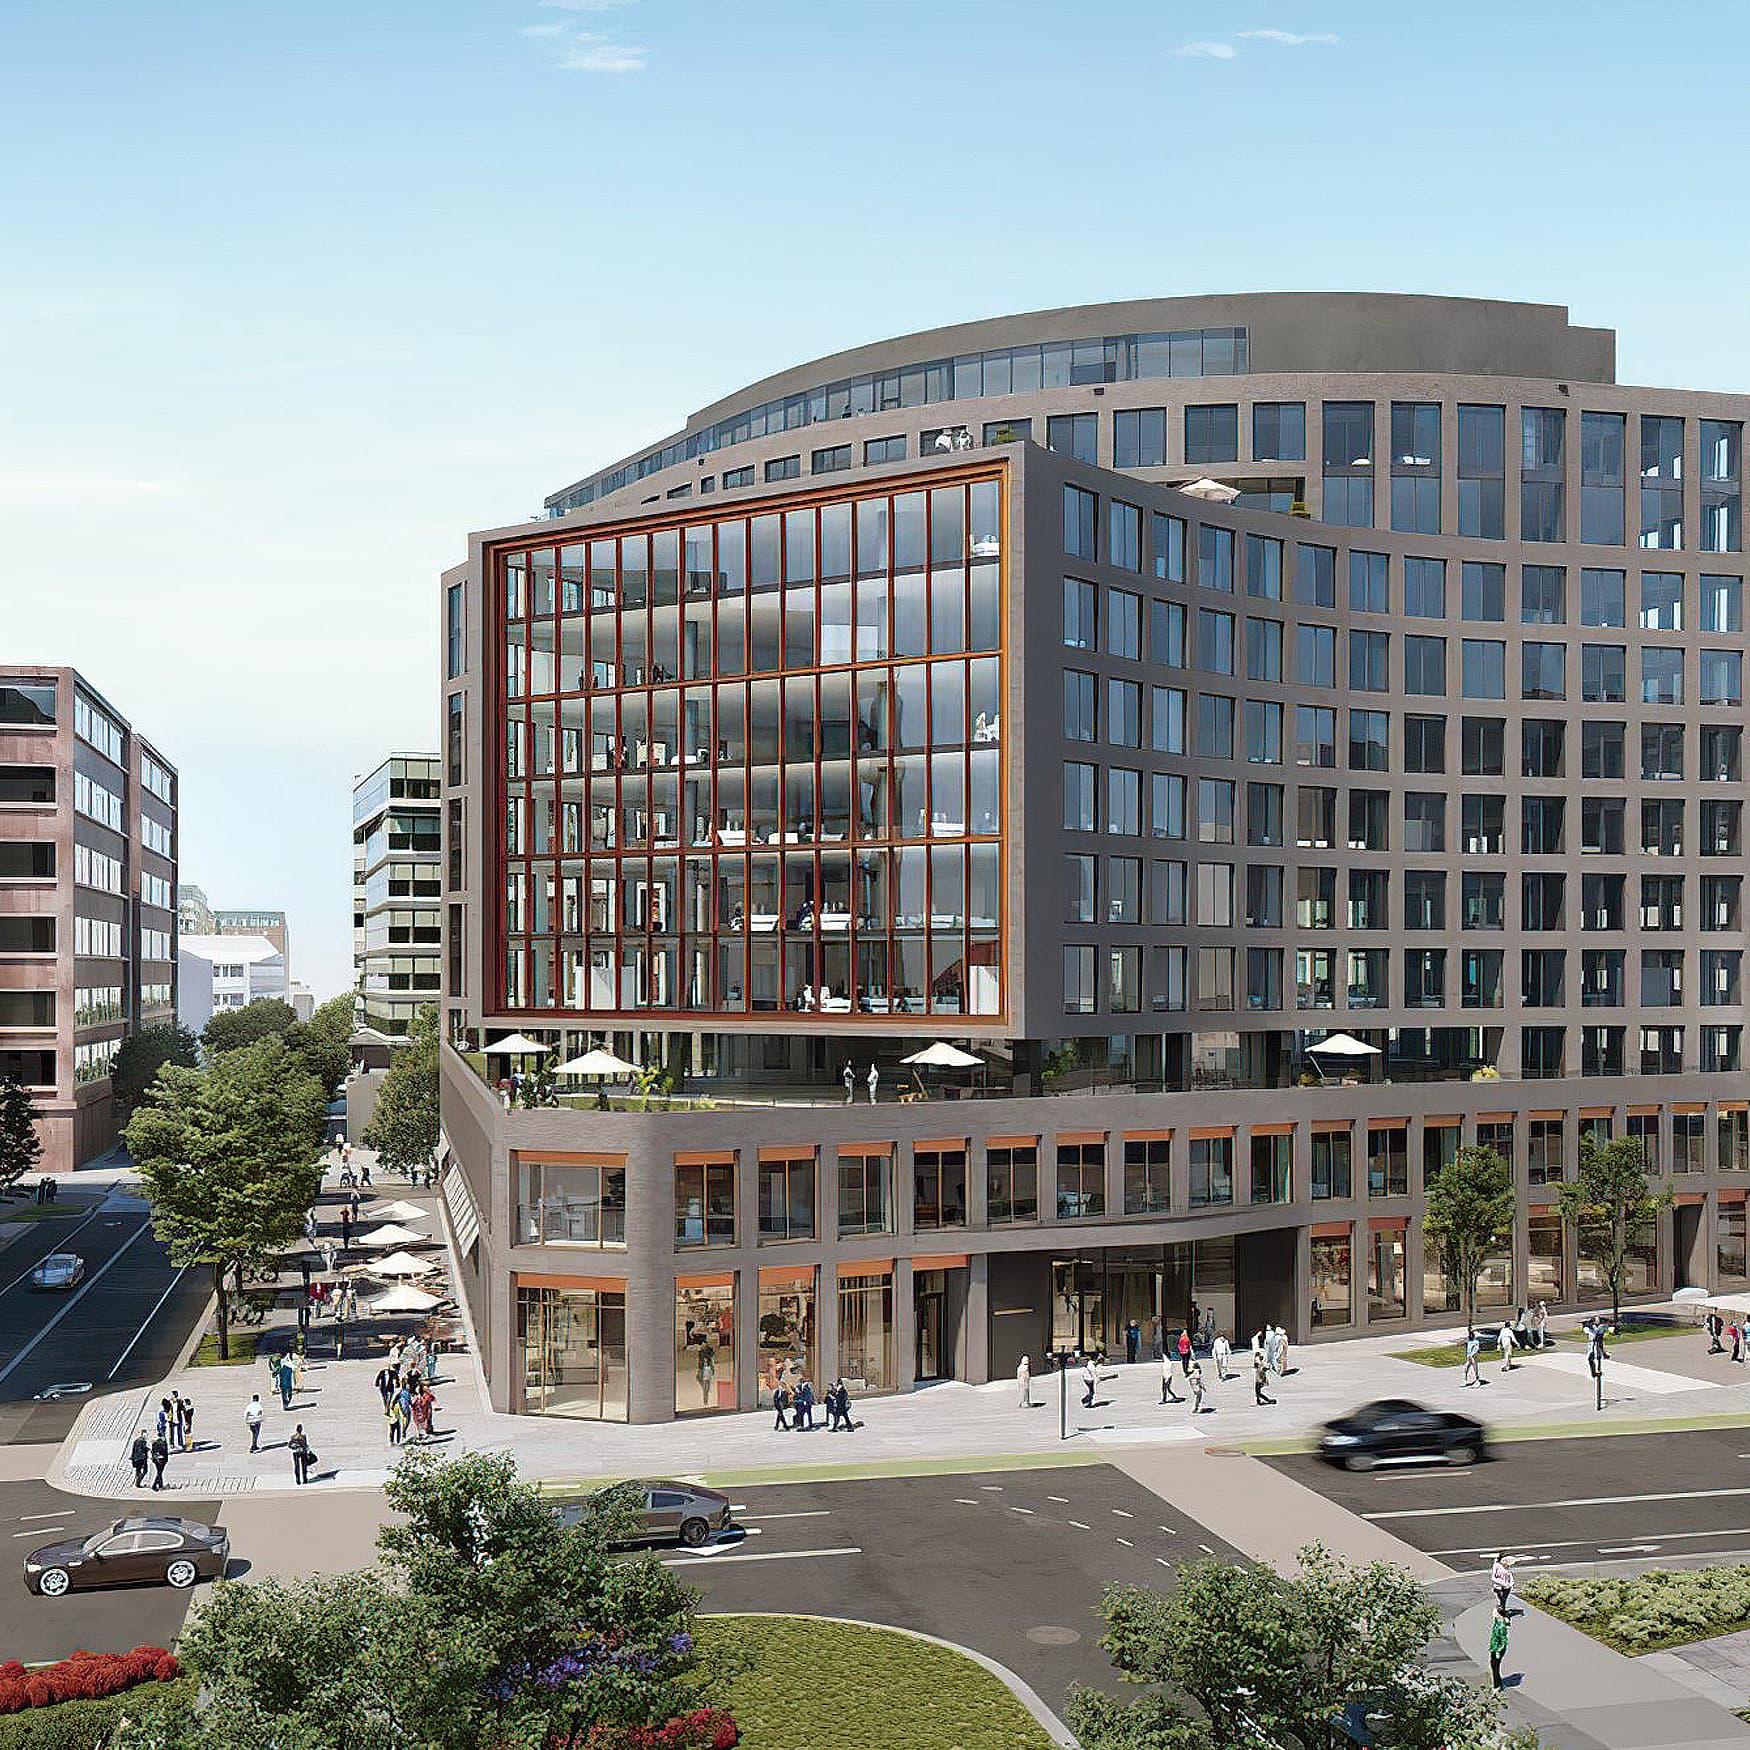 Aerial rendering of Chemonics International Headquarters in Washington, D.C.